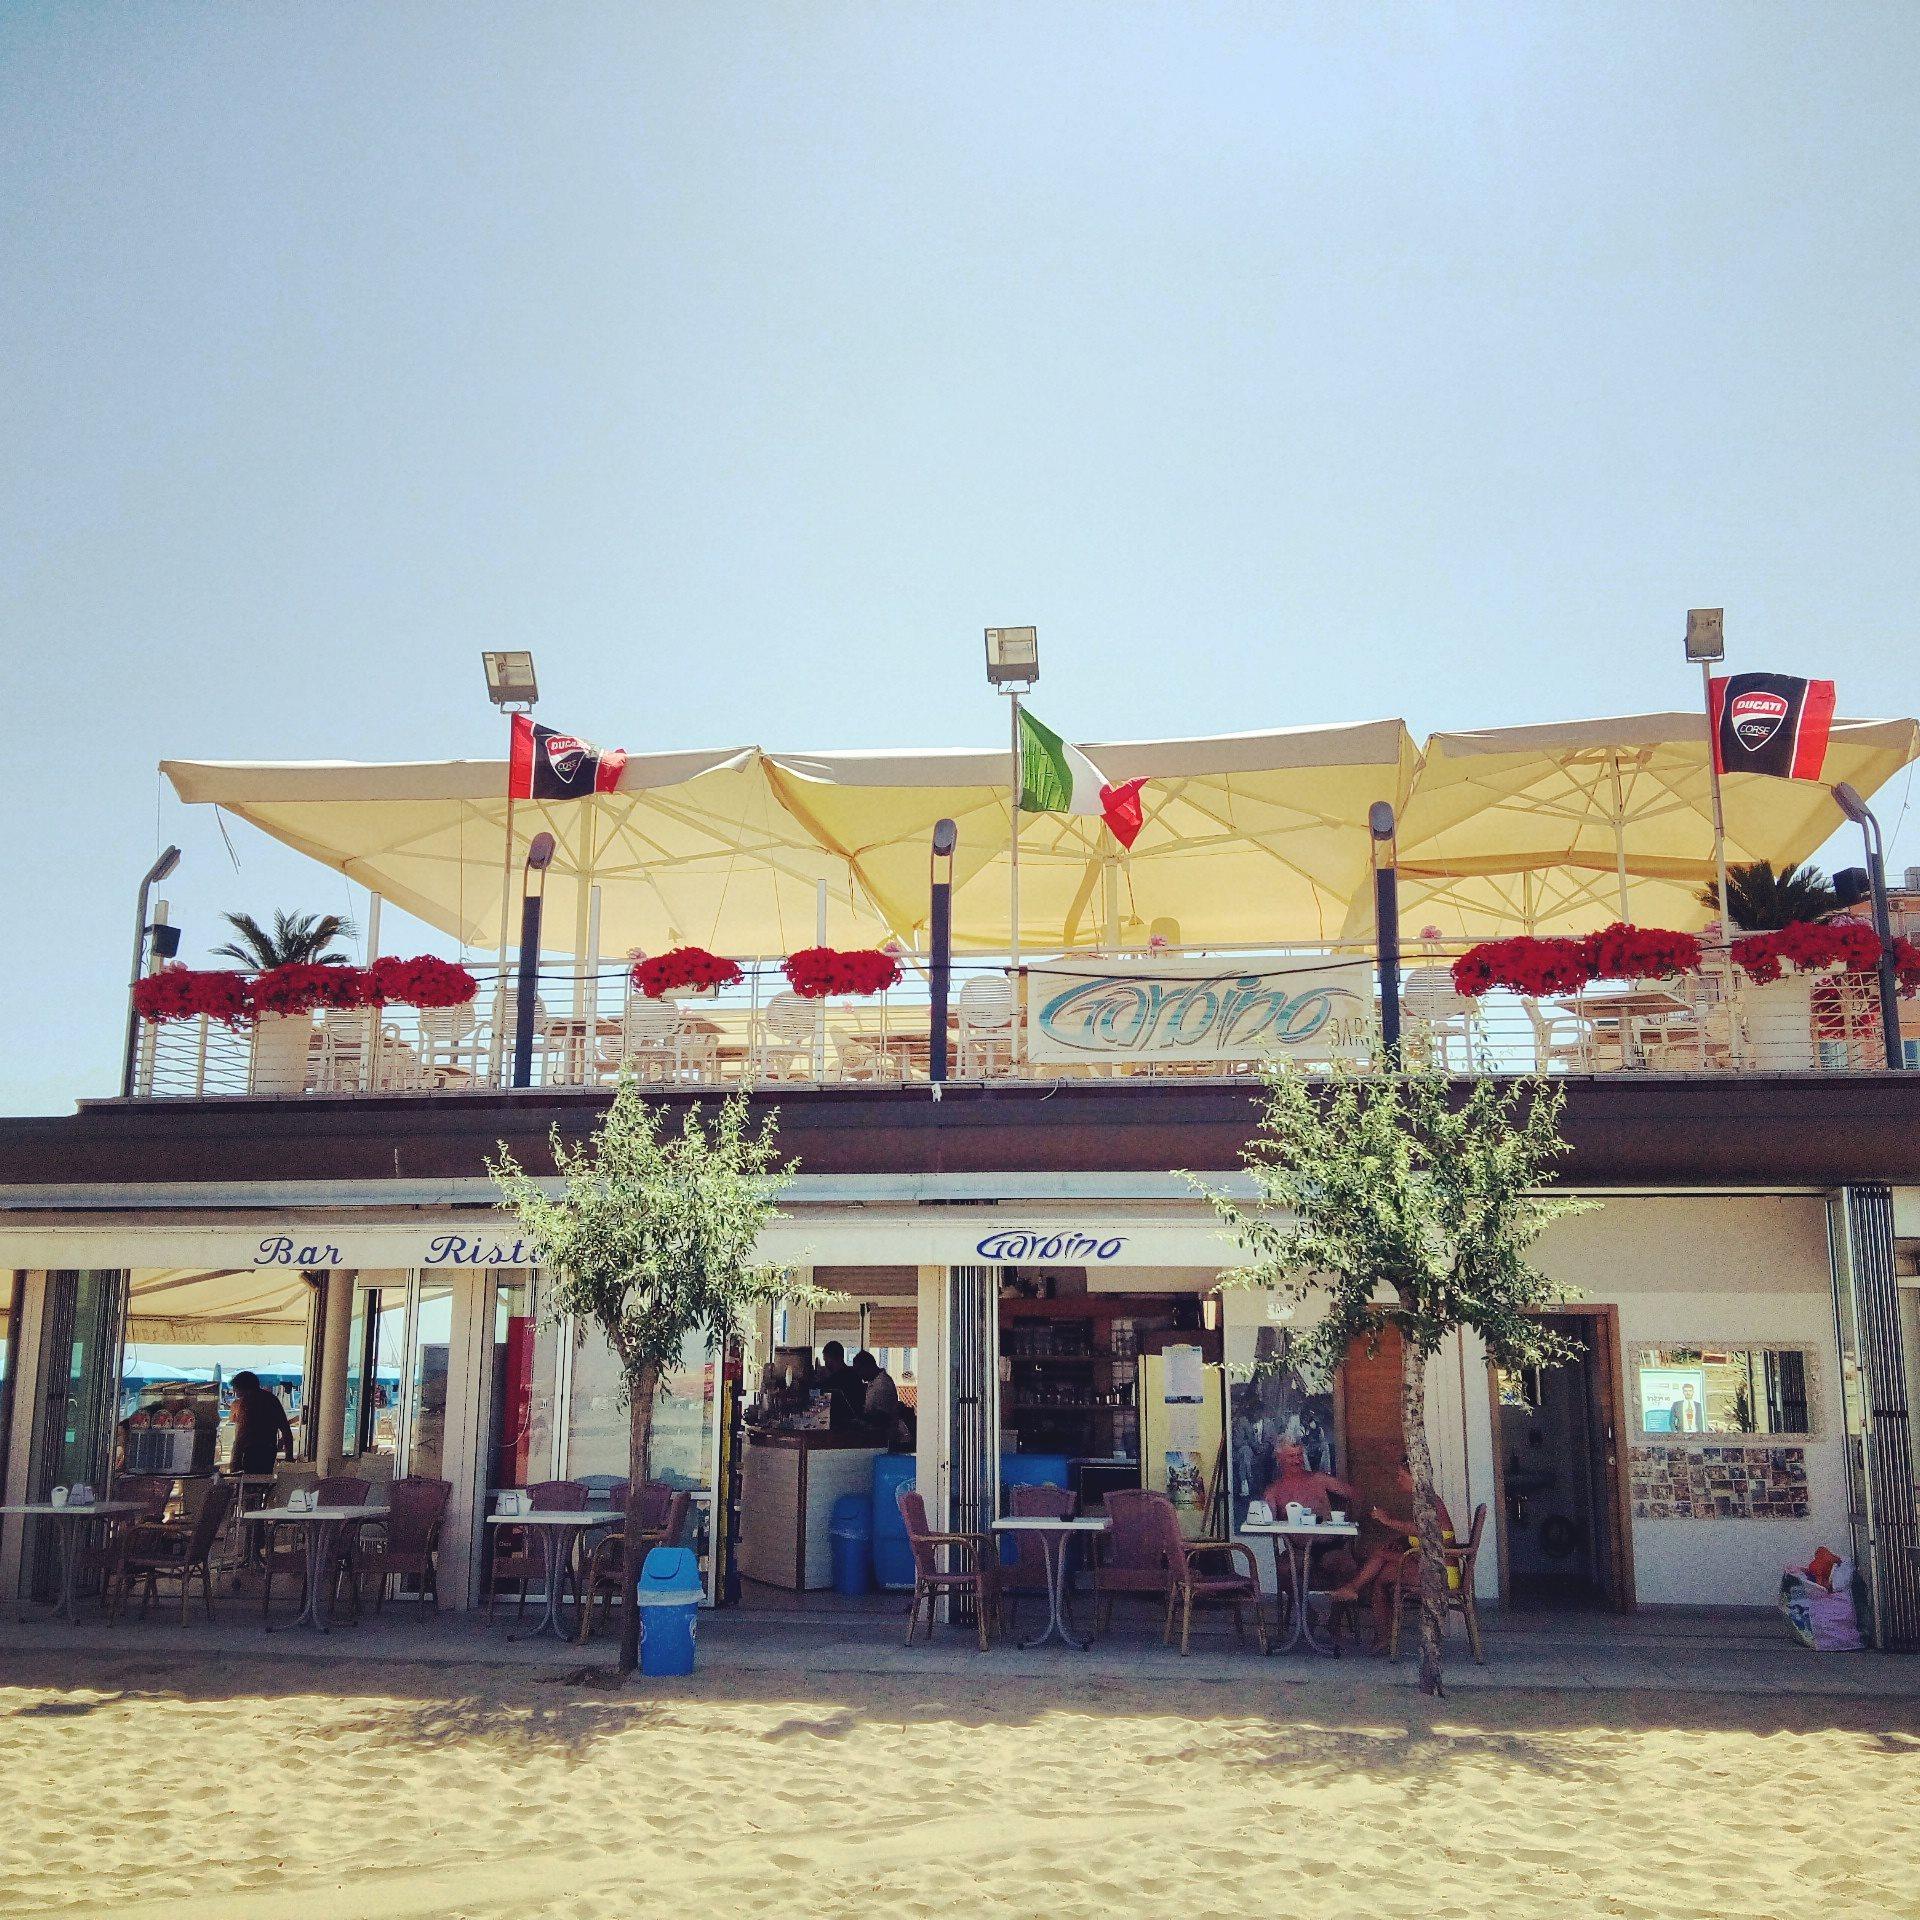 Garbino Bar Ristorante